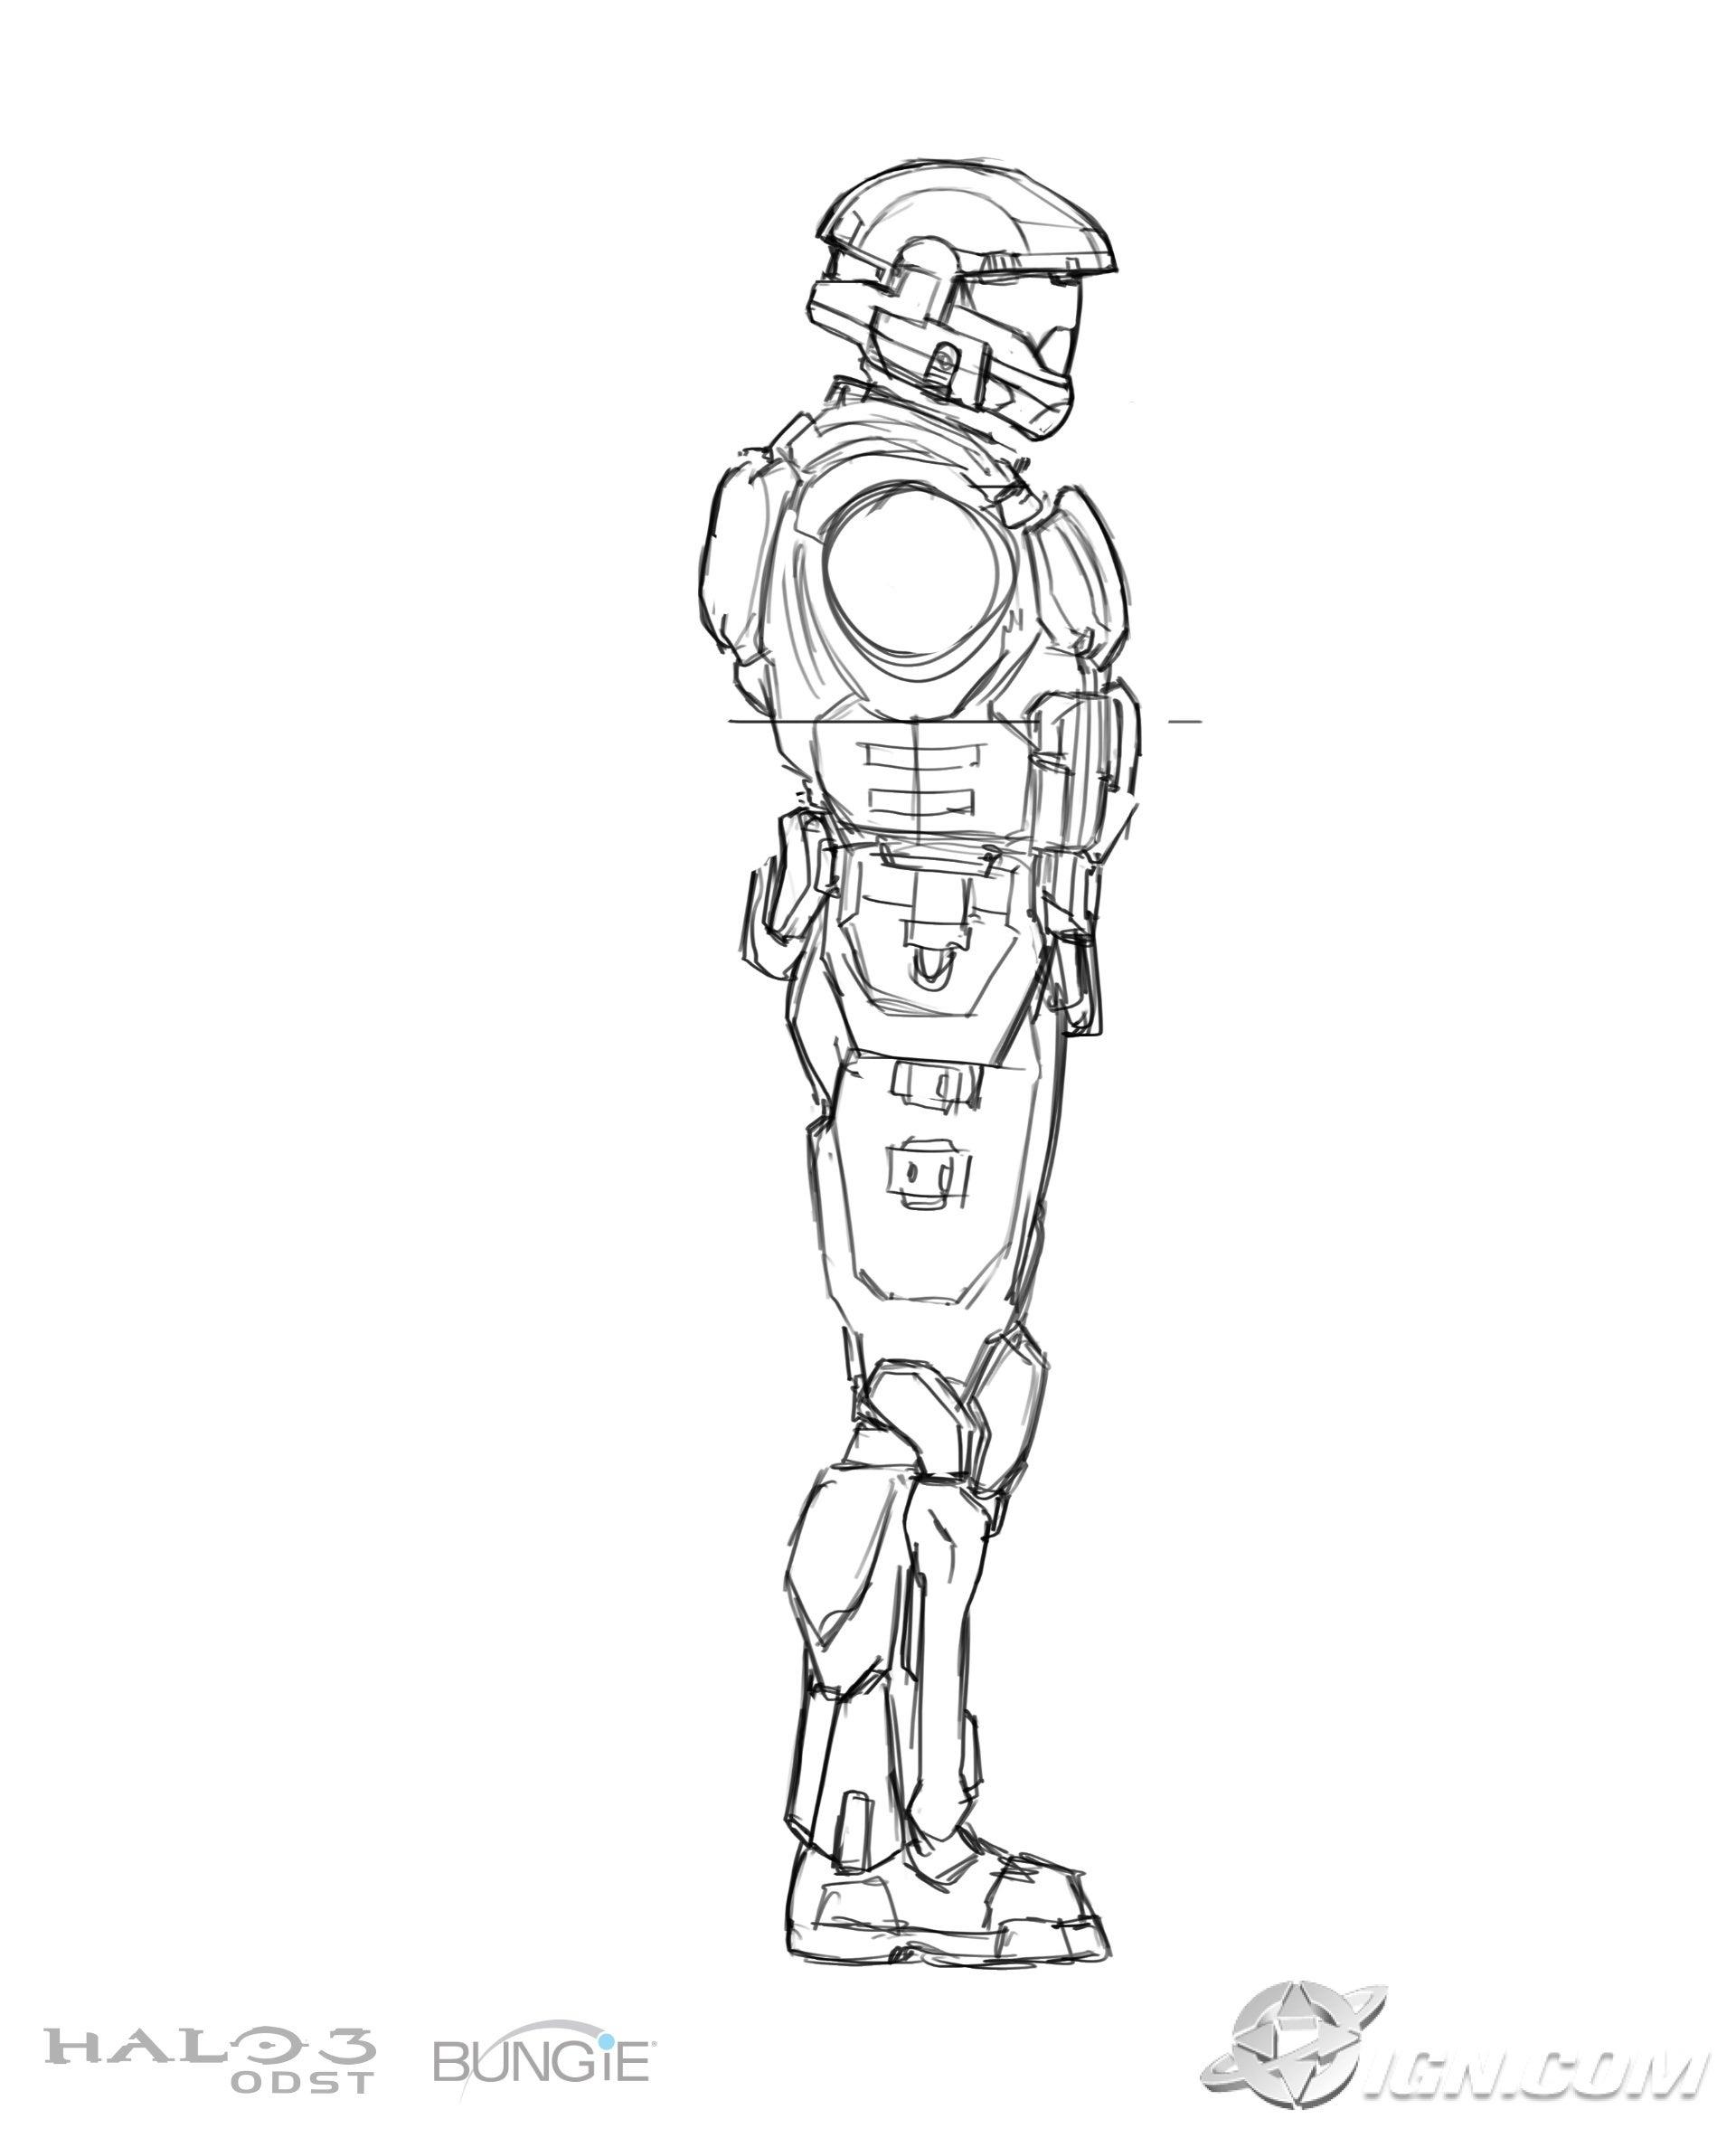 Halo X360 Halo 3 Odst